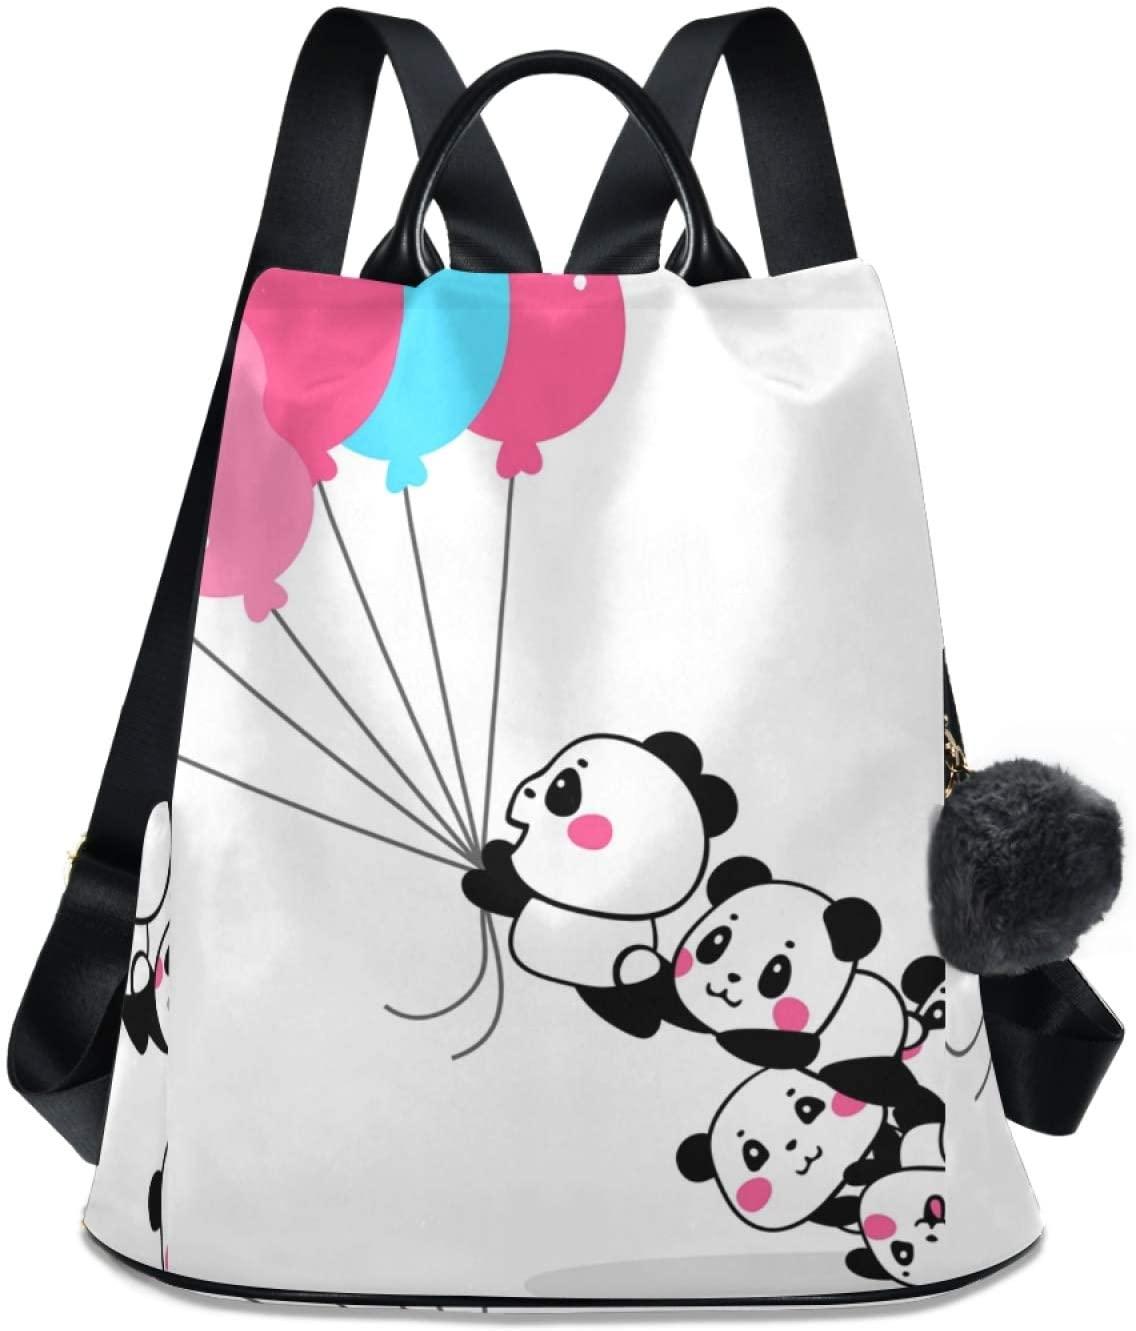 Ladies Backpack Panda Balloon School Backpack Shoulder Bag for Boys Girls Teens Schoolbag Travel Bag Bookbag